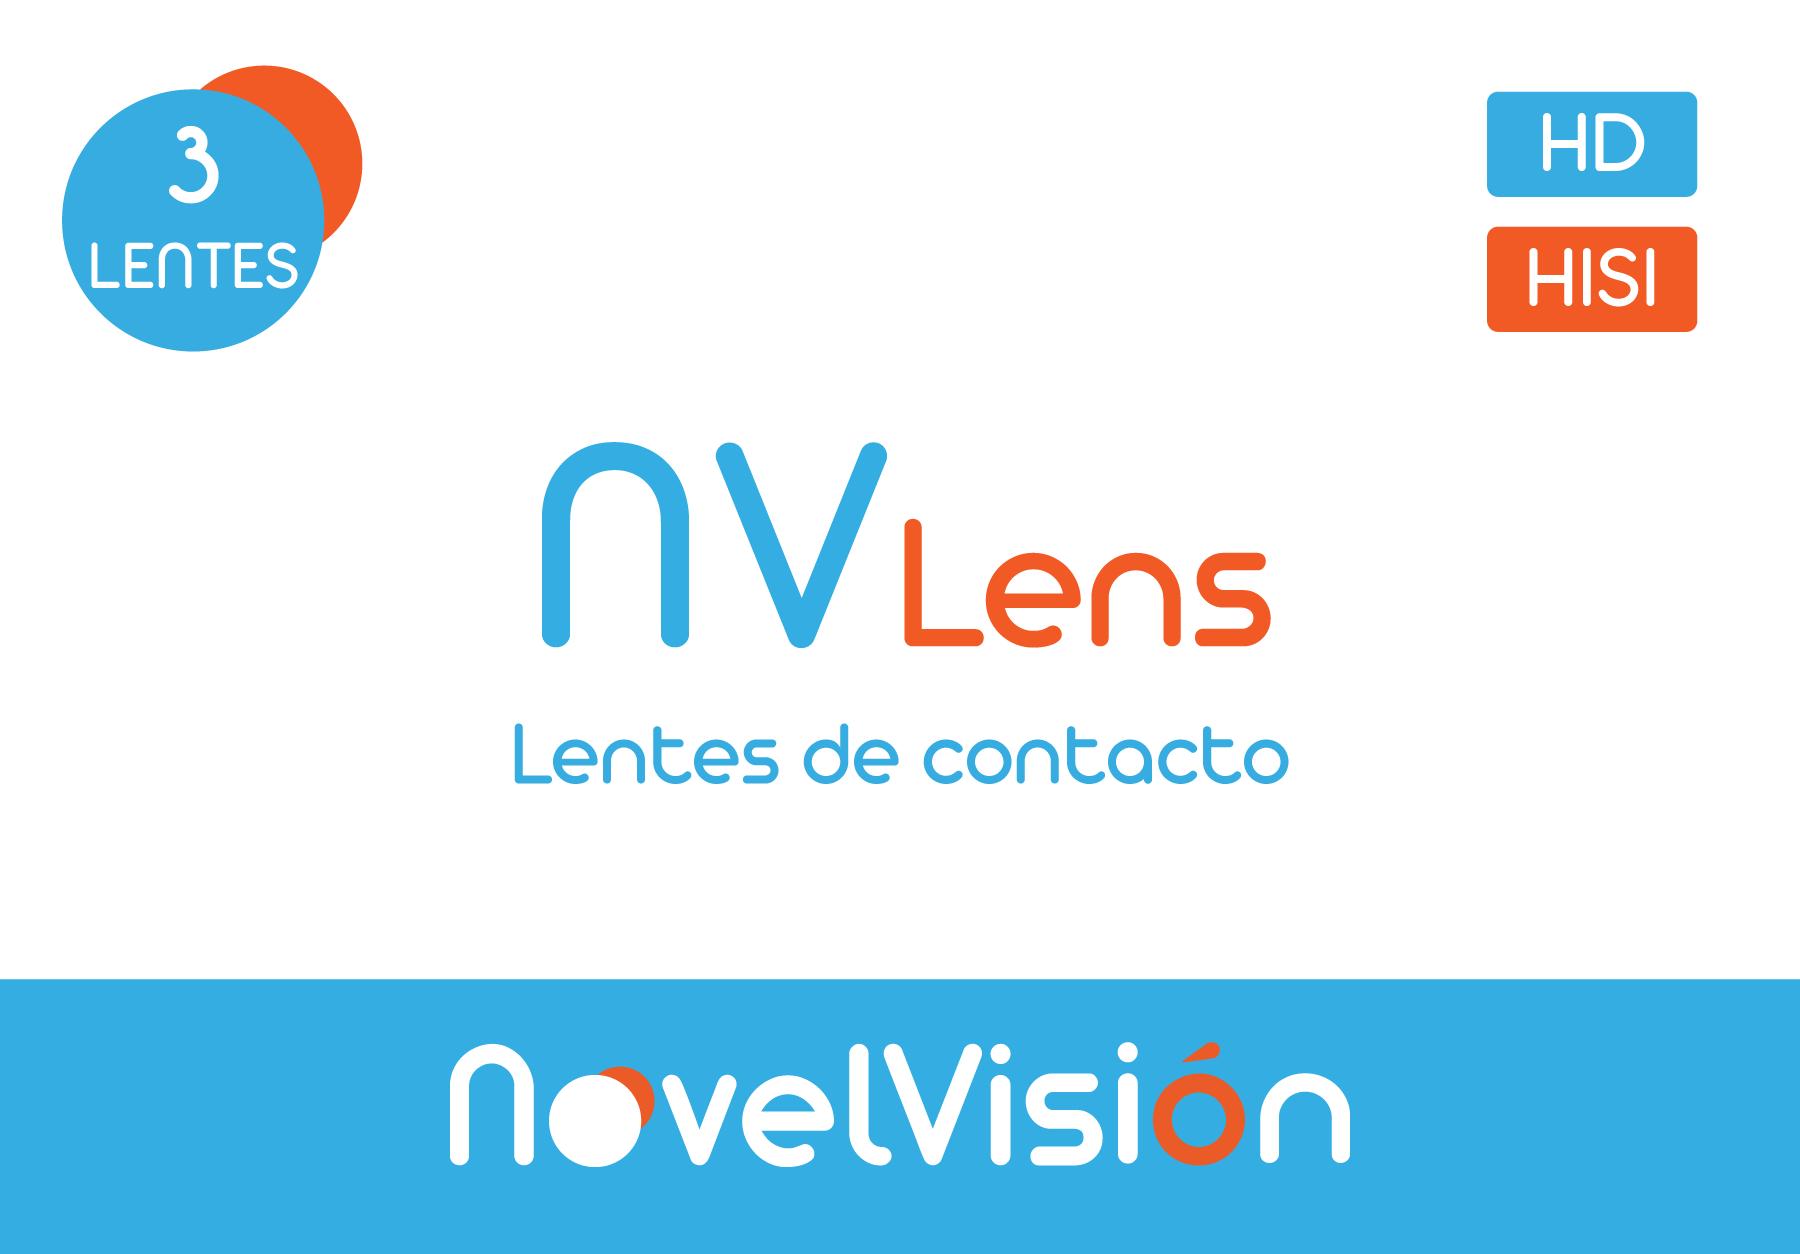 Novelvision Banner-Ancho-2 INICIO